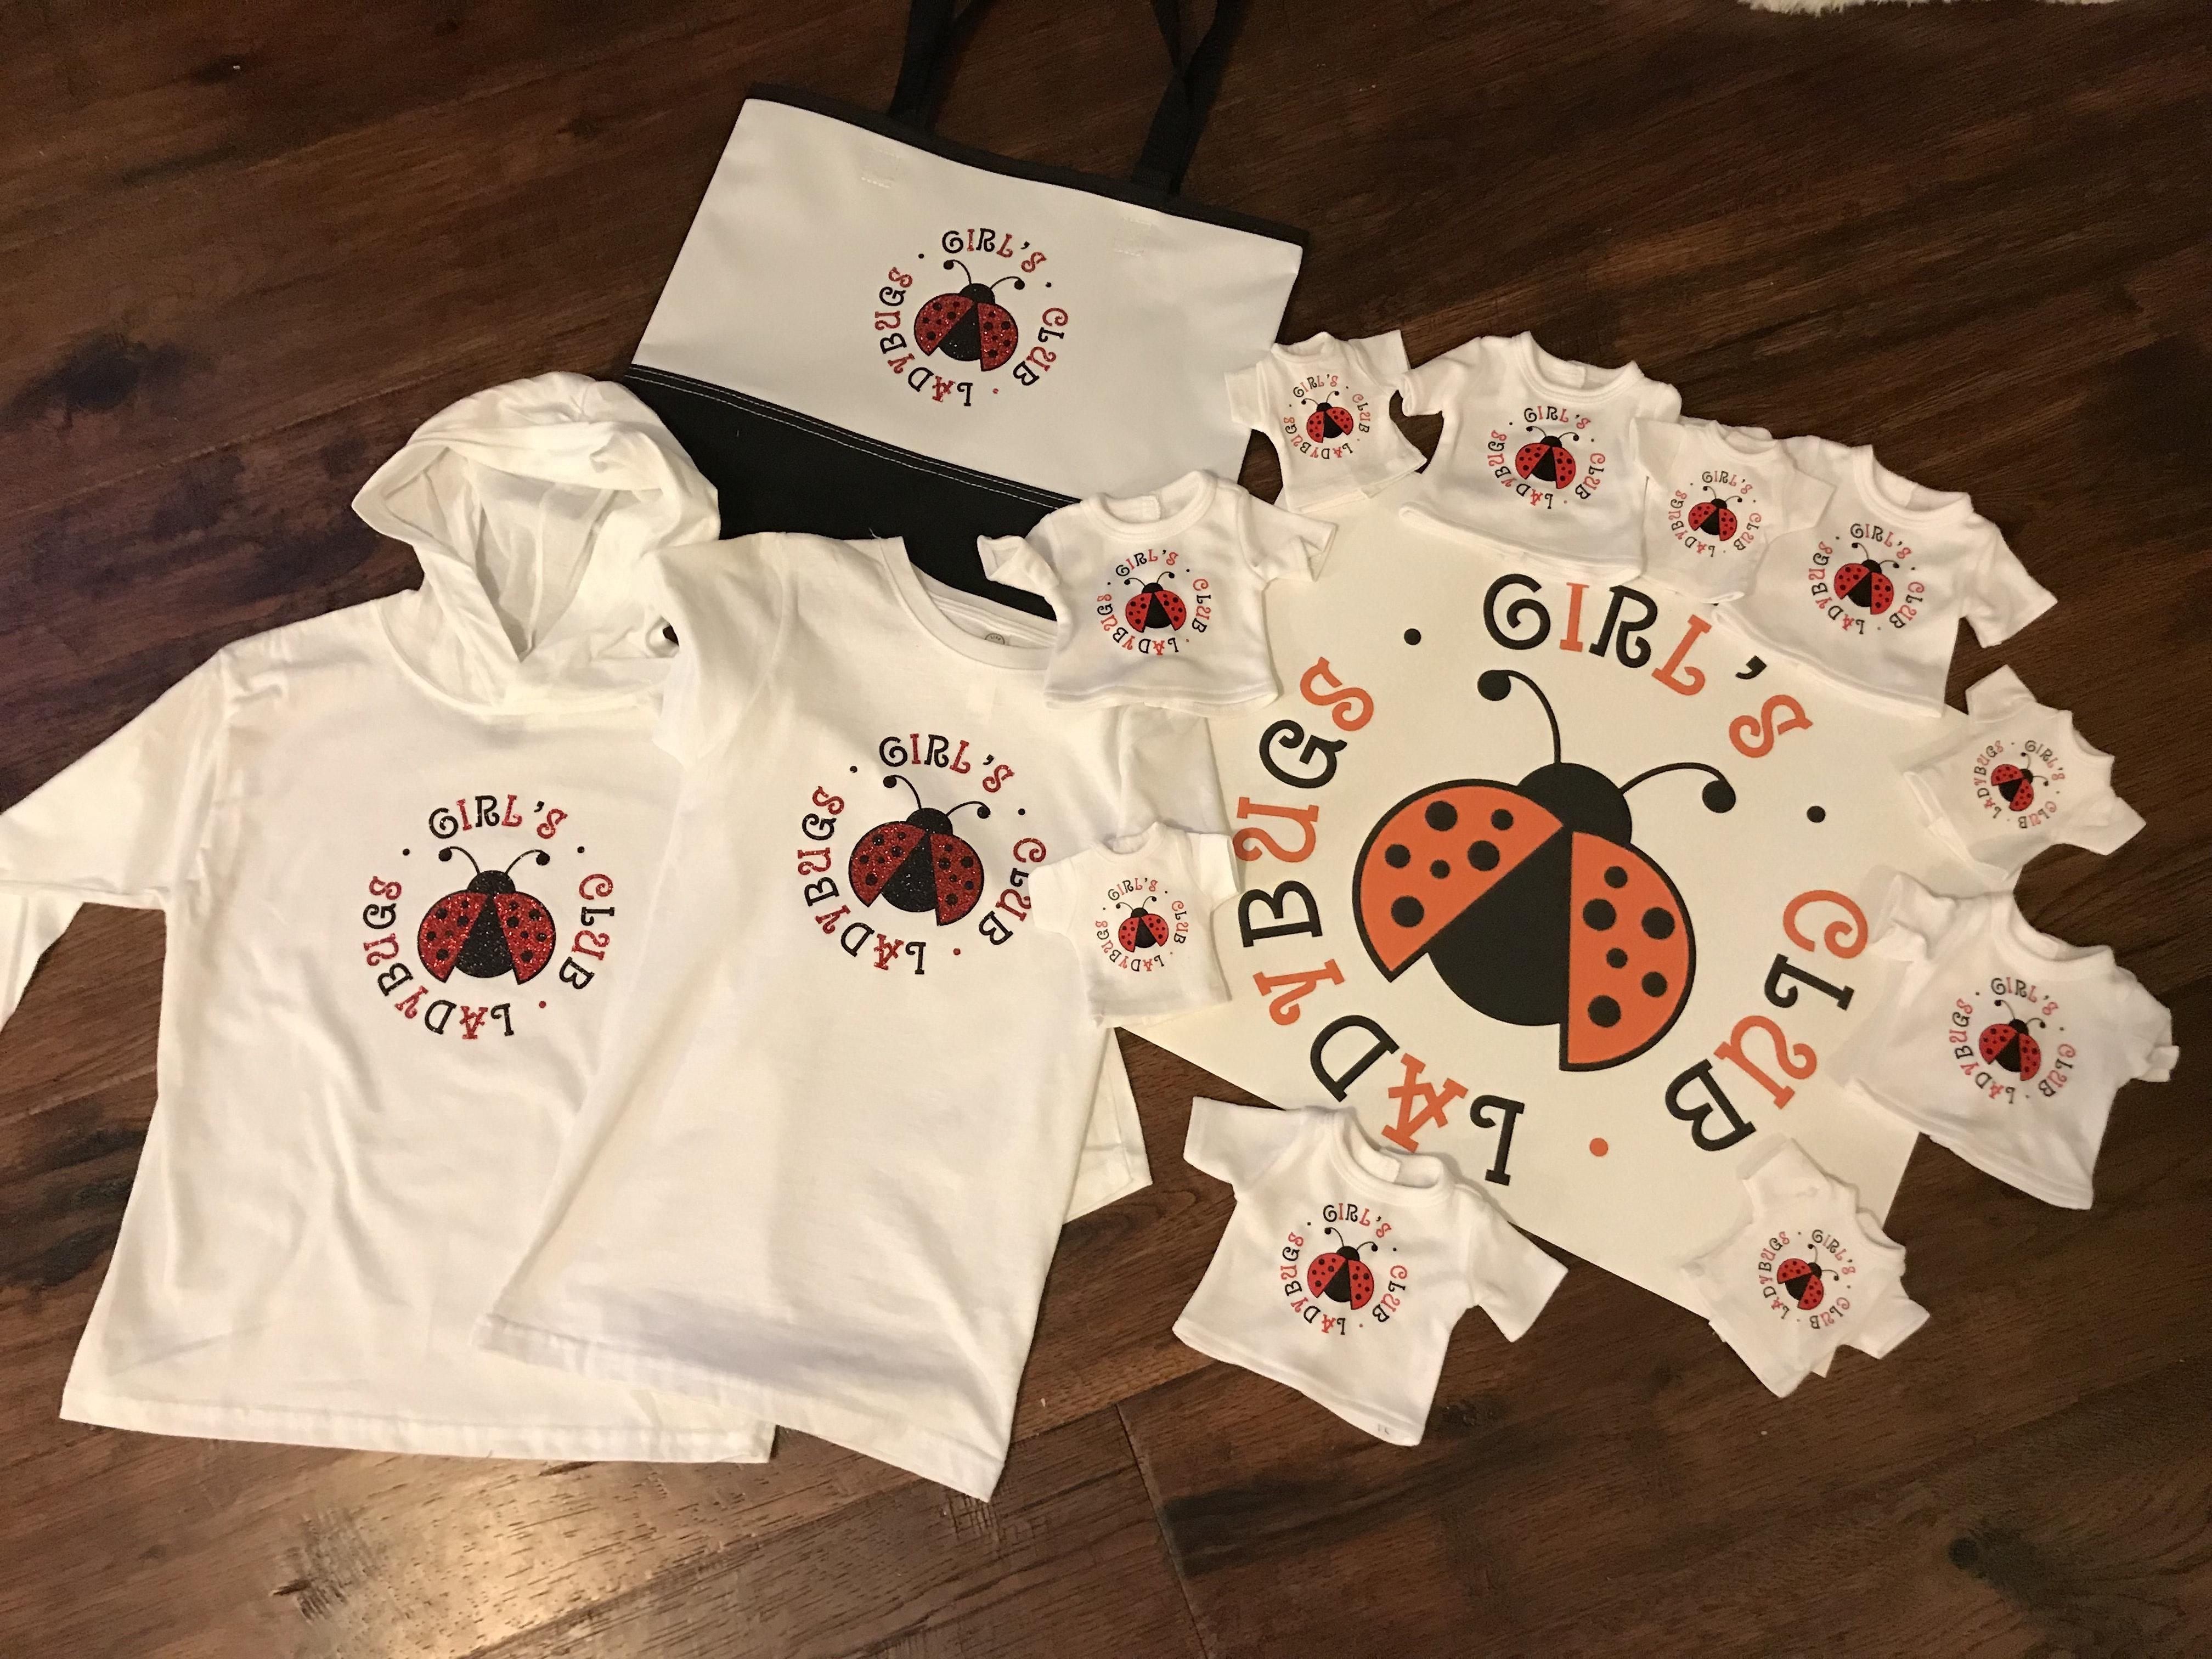 Anvil 987B customer review by Amanda Decker Great hooded tshirts